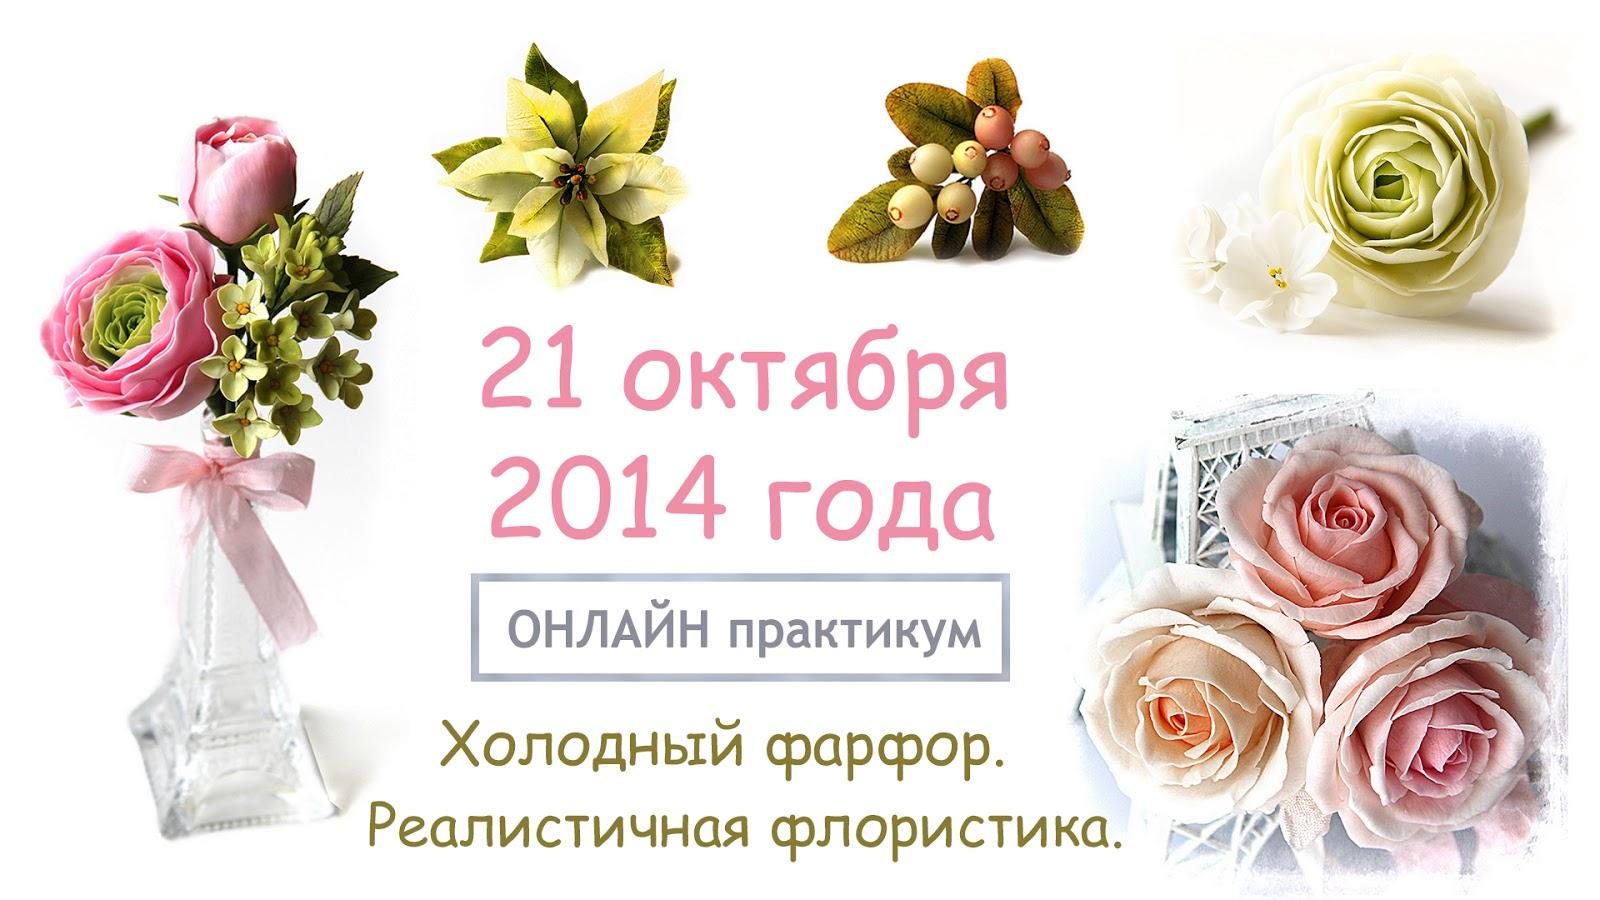 http://krasota8.ru/h/257